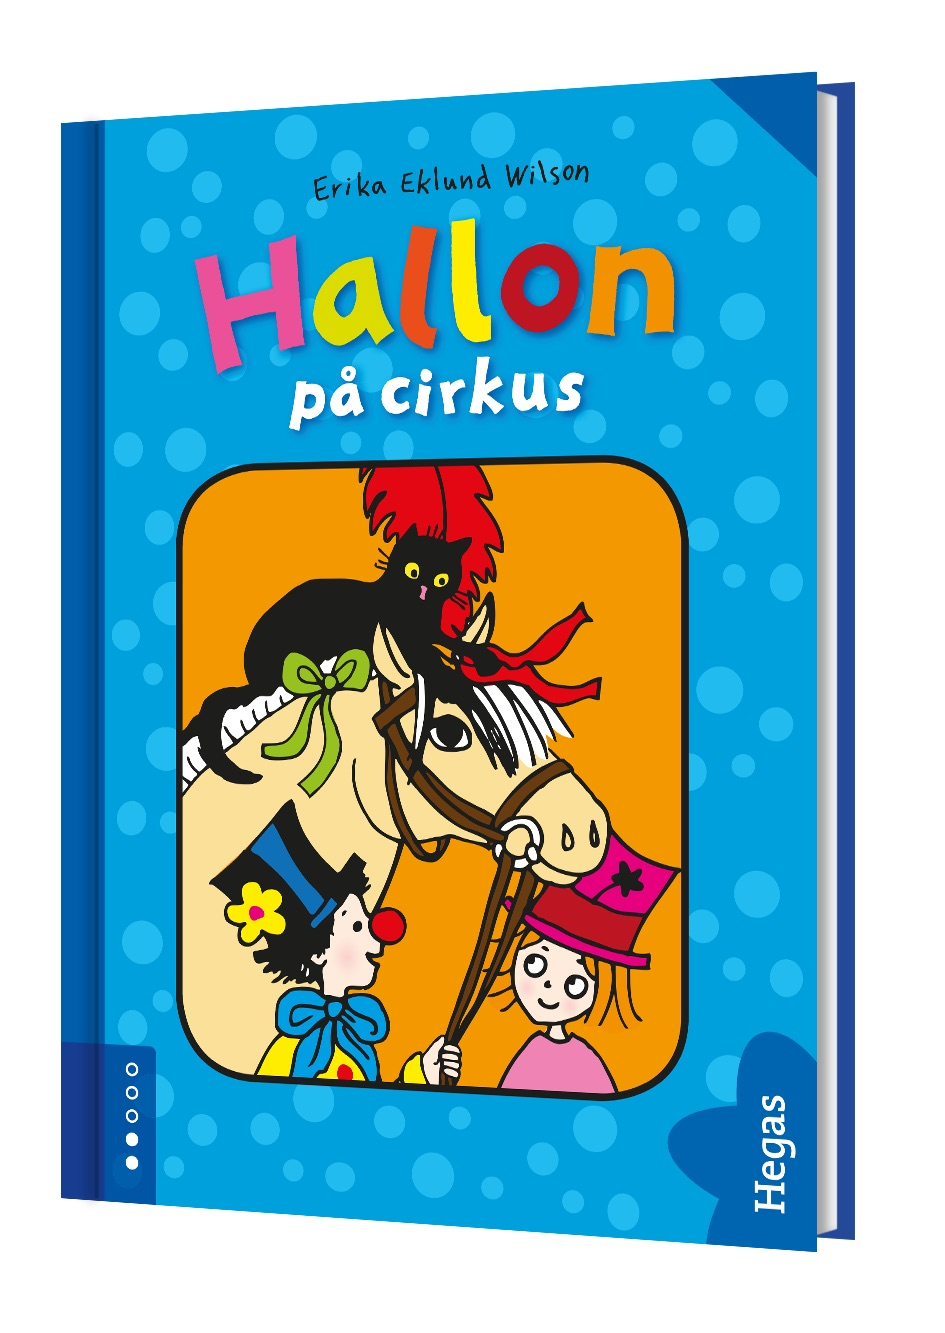 Hallon på cirkus (Bok+CD) av Erika Eklund Wilson